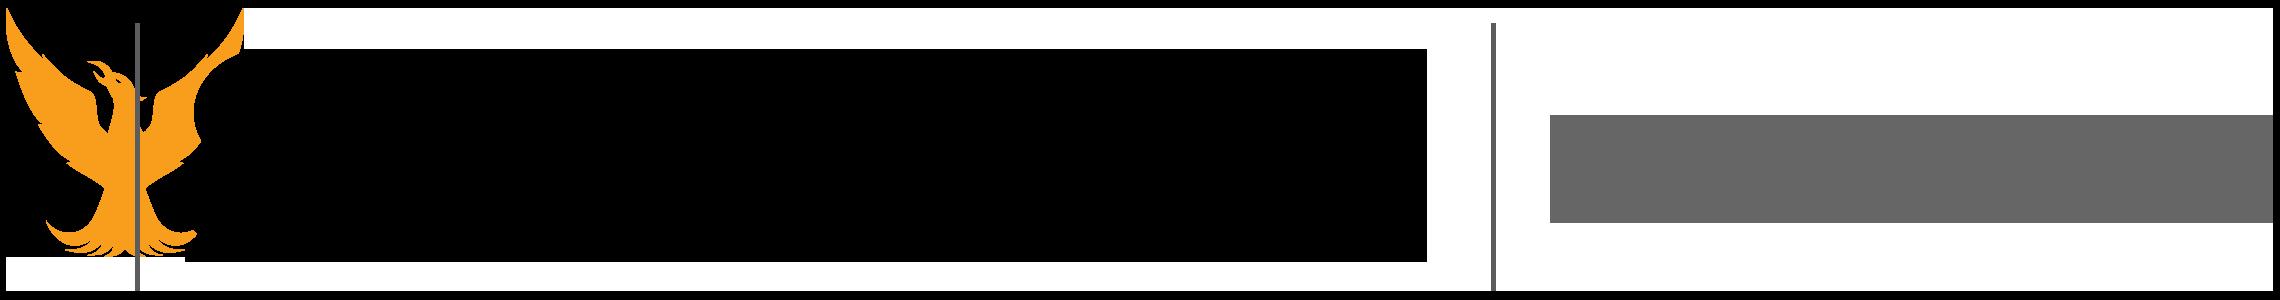 SpectoBowlingLogo-Black-Horizontal.png